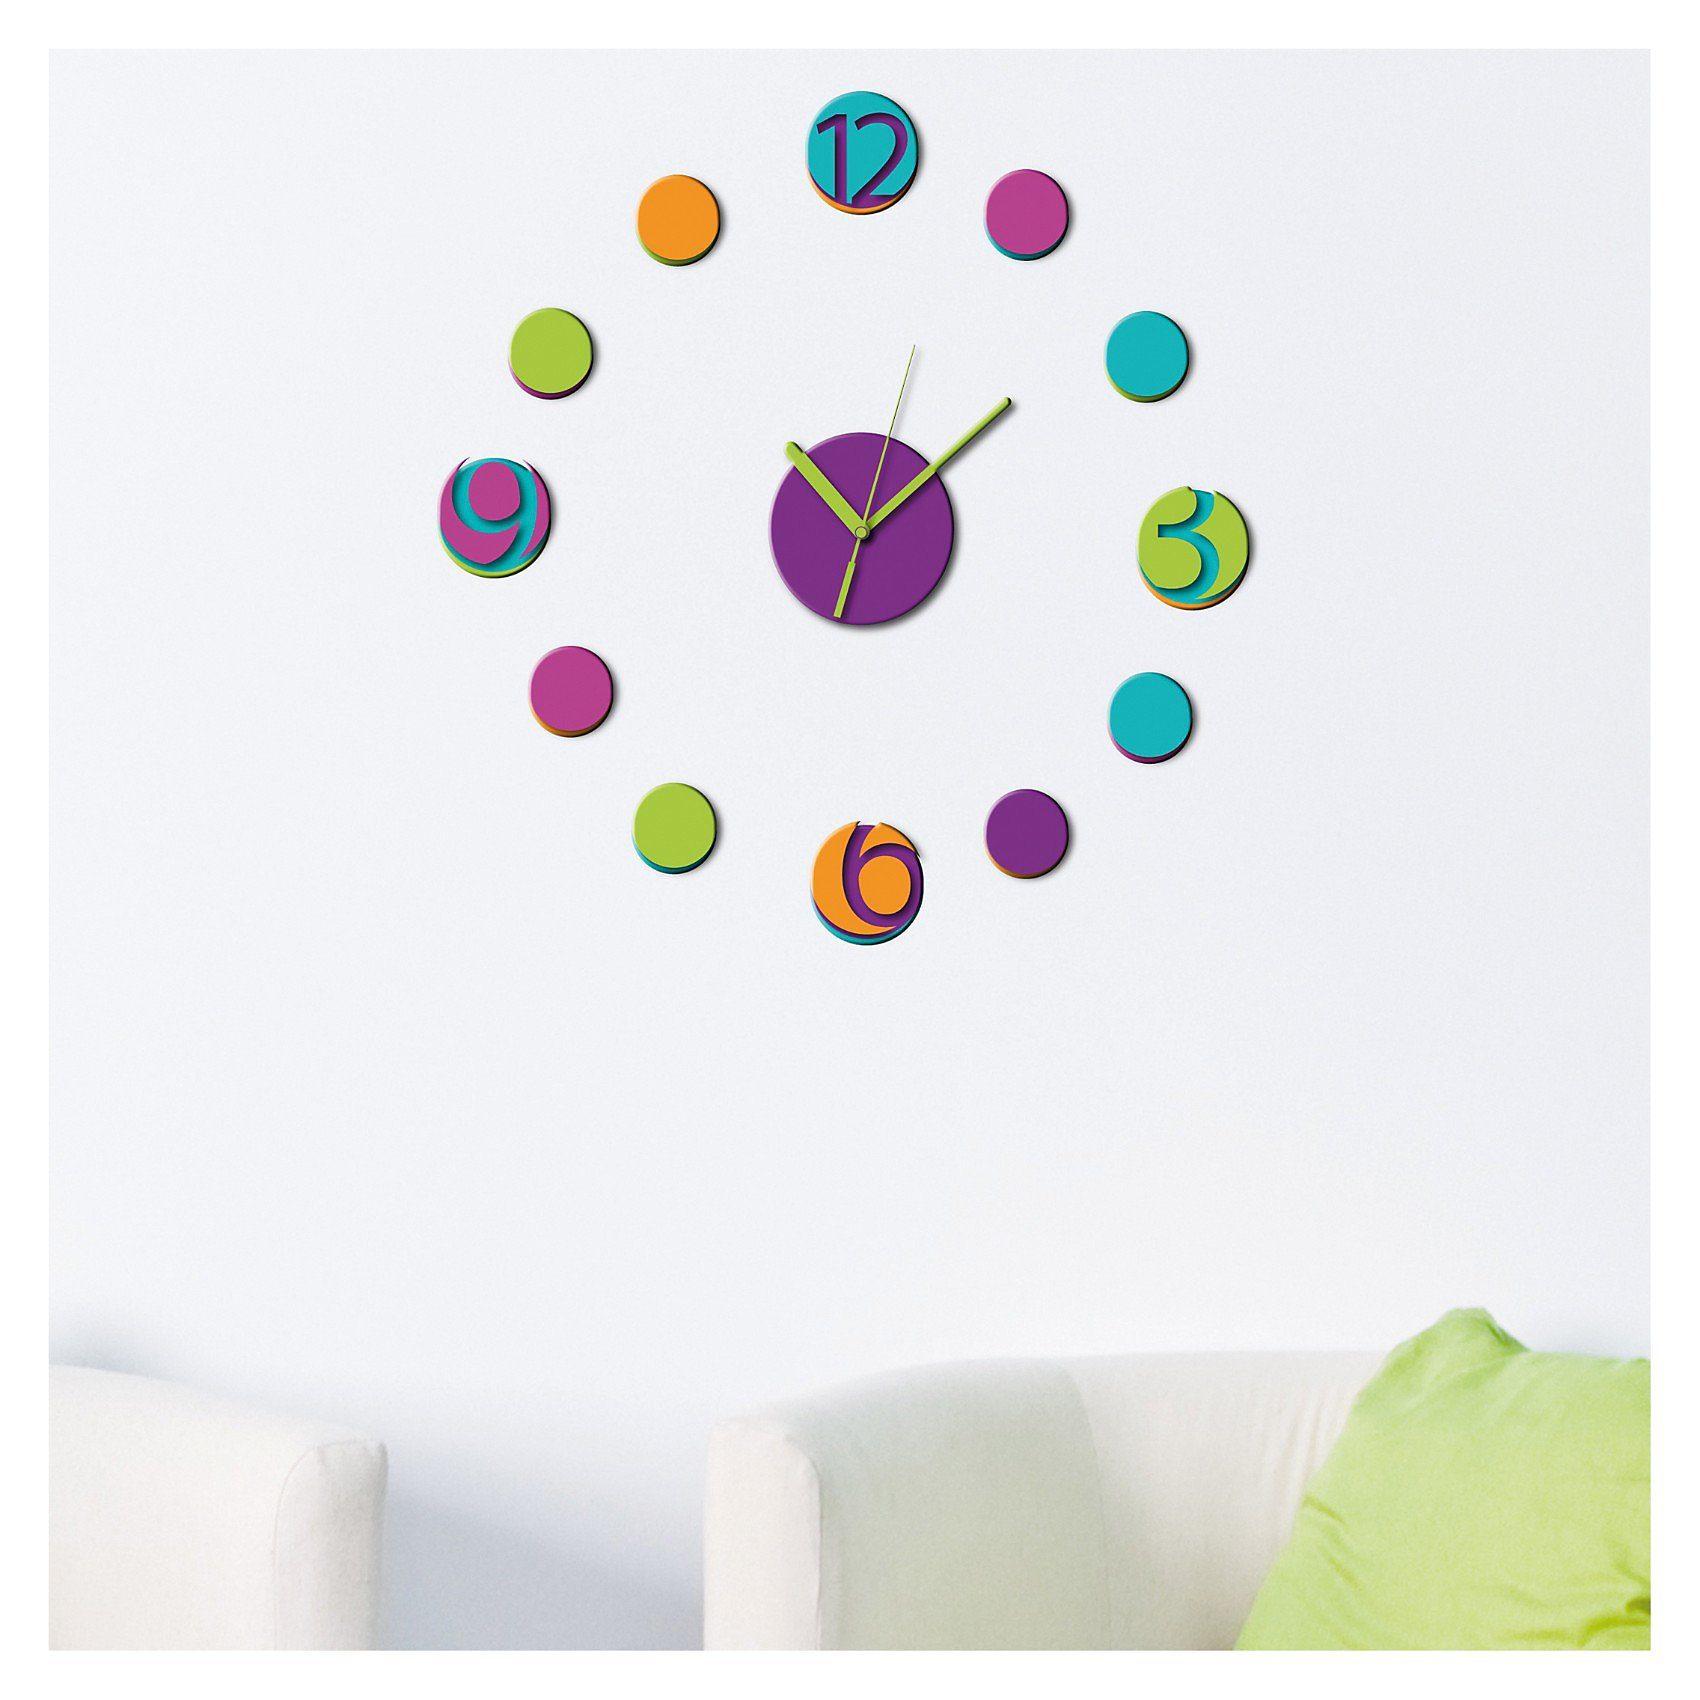 Wandsticker 3D Uhr, 13-tlg.